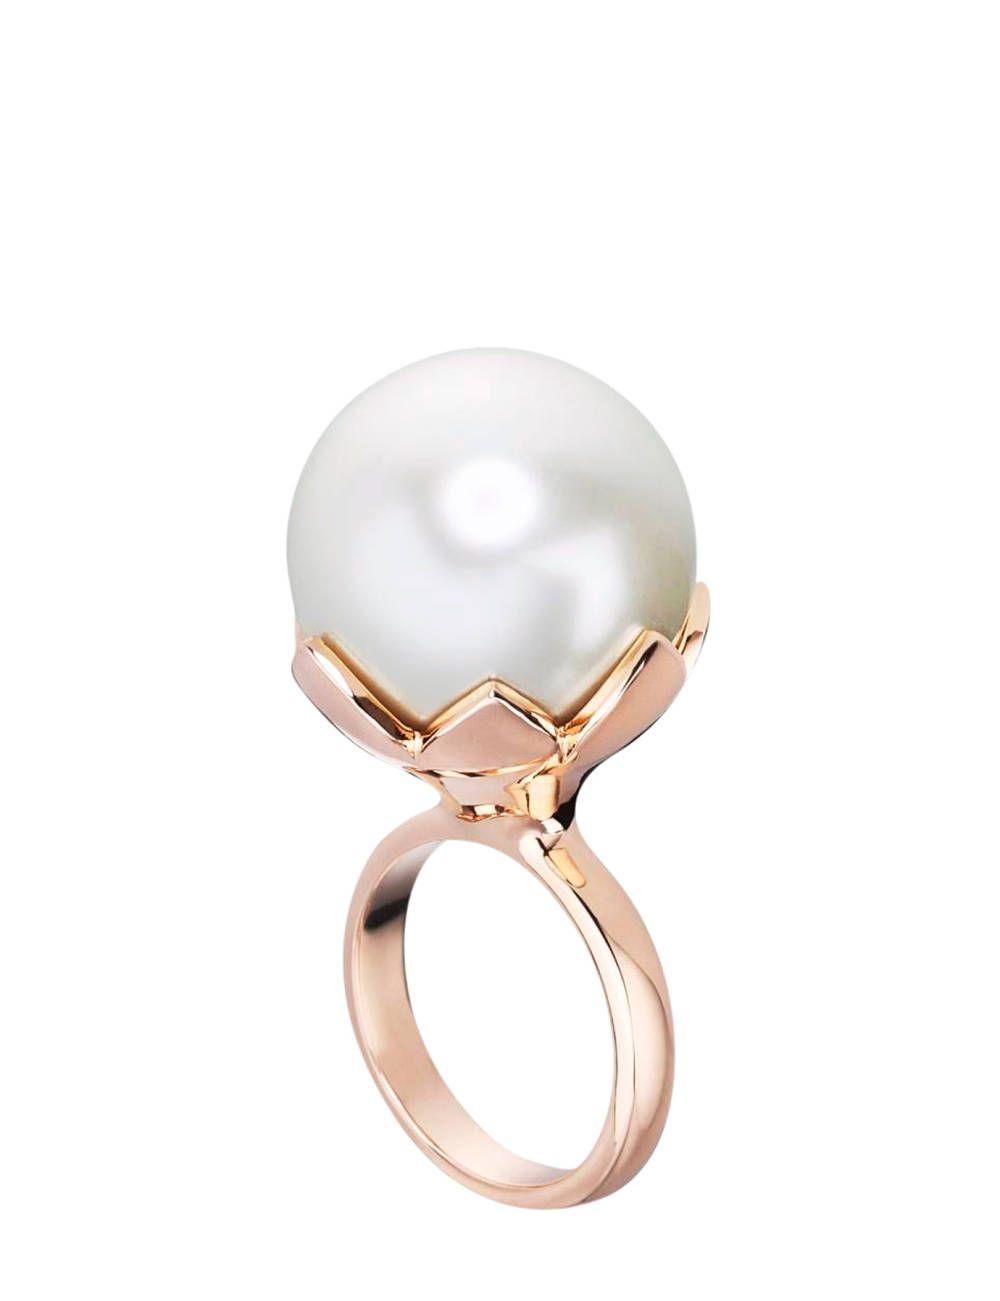 5d385f9598e5 Christian Dior ring.